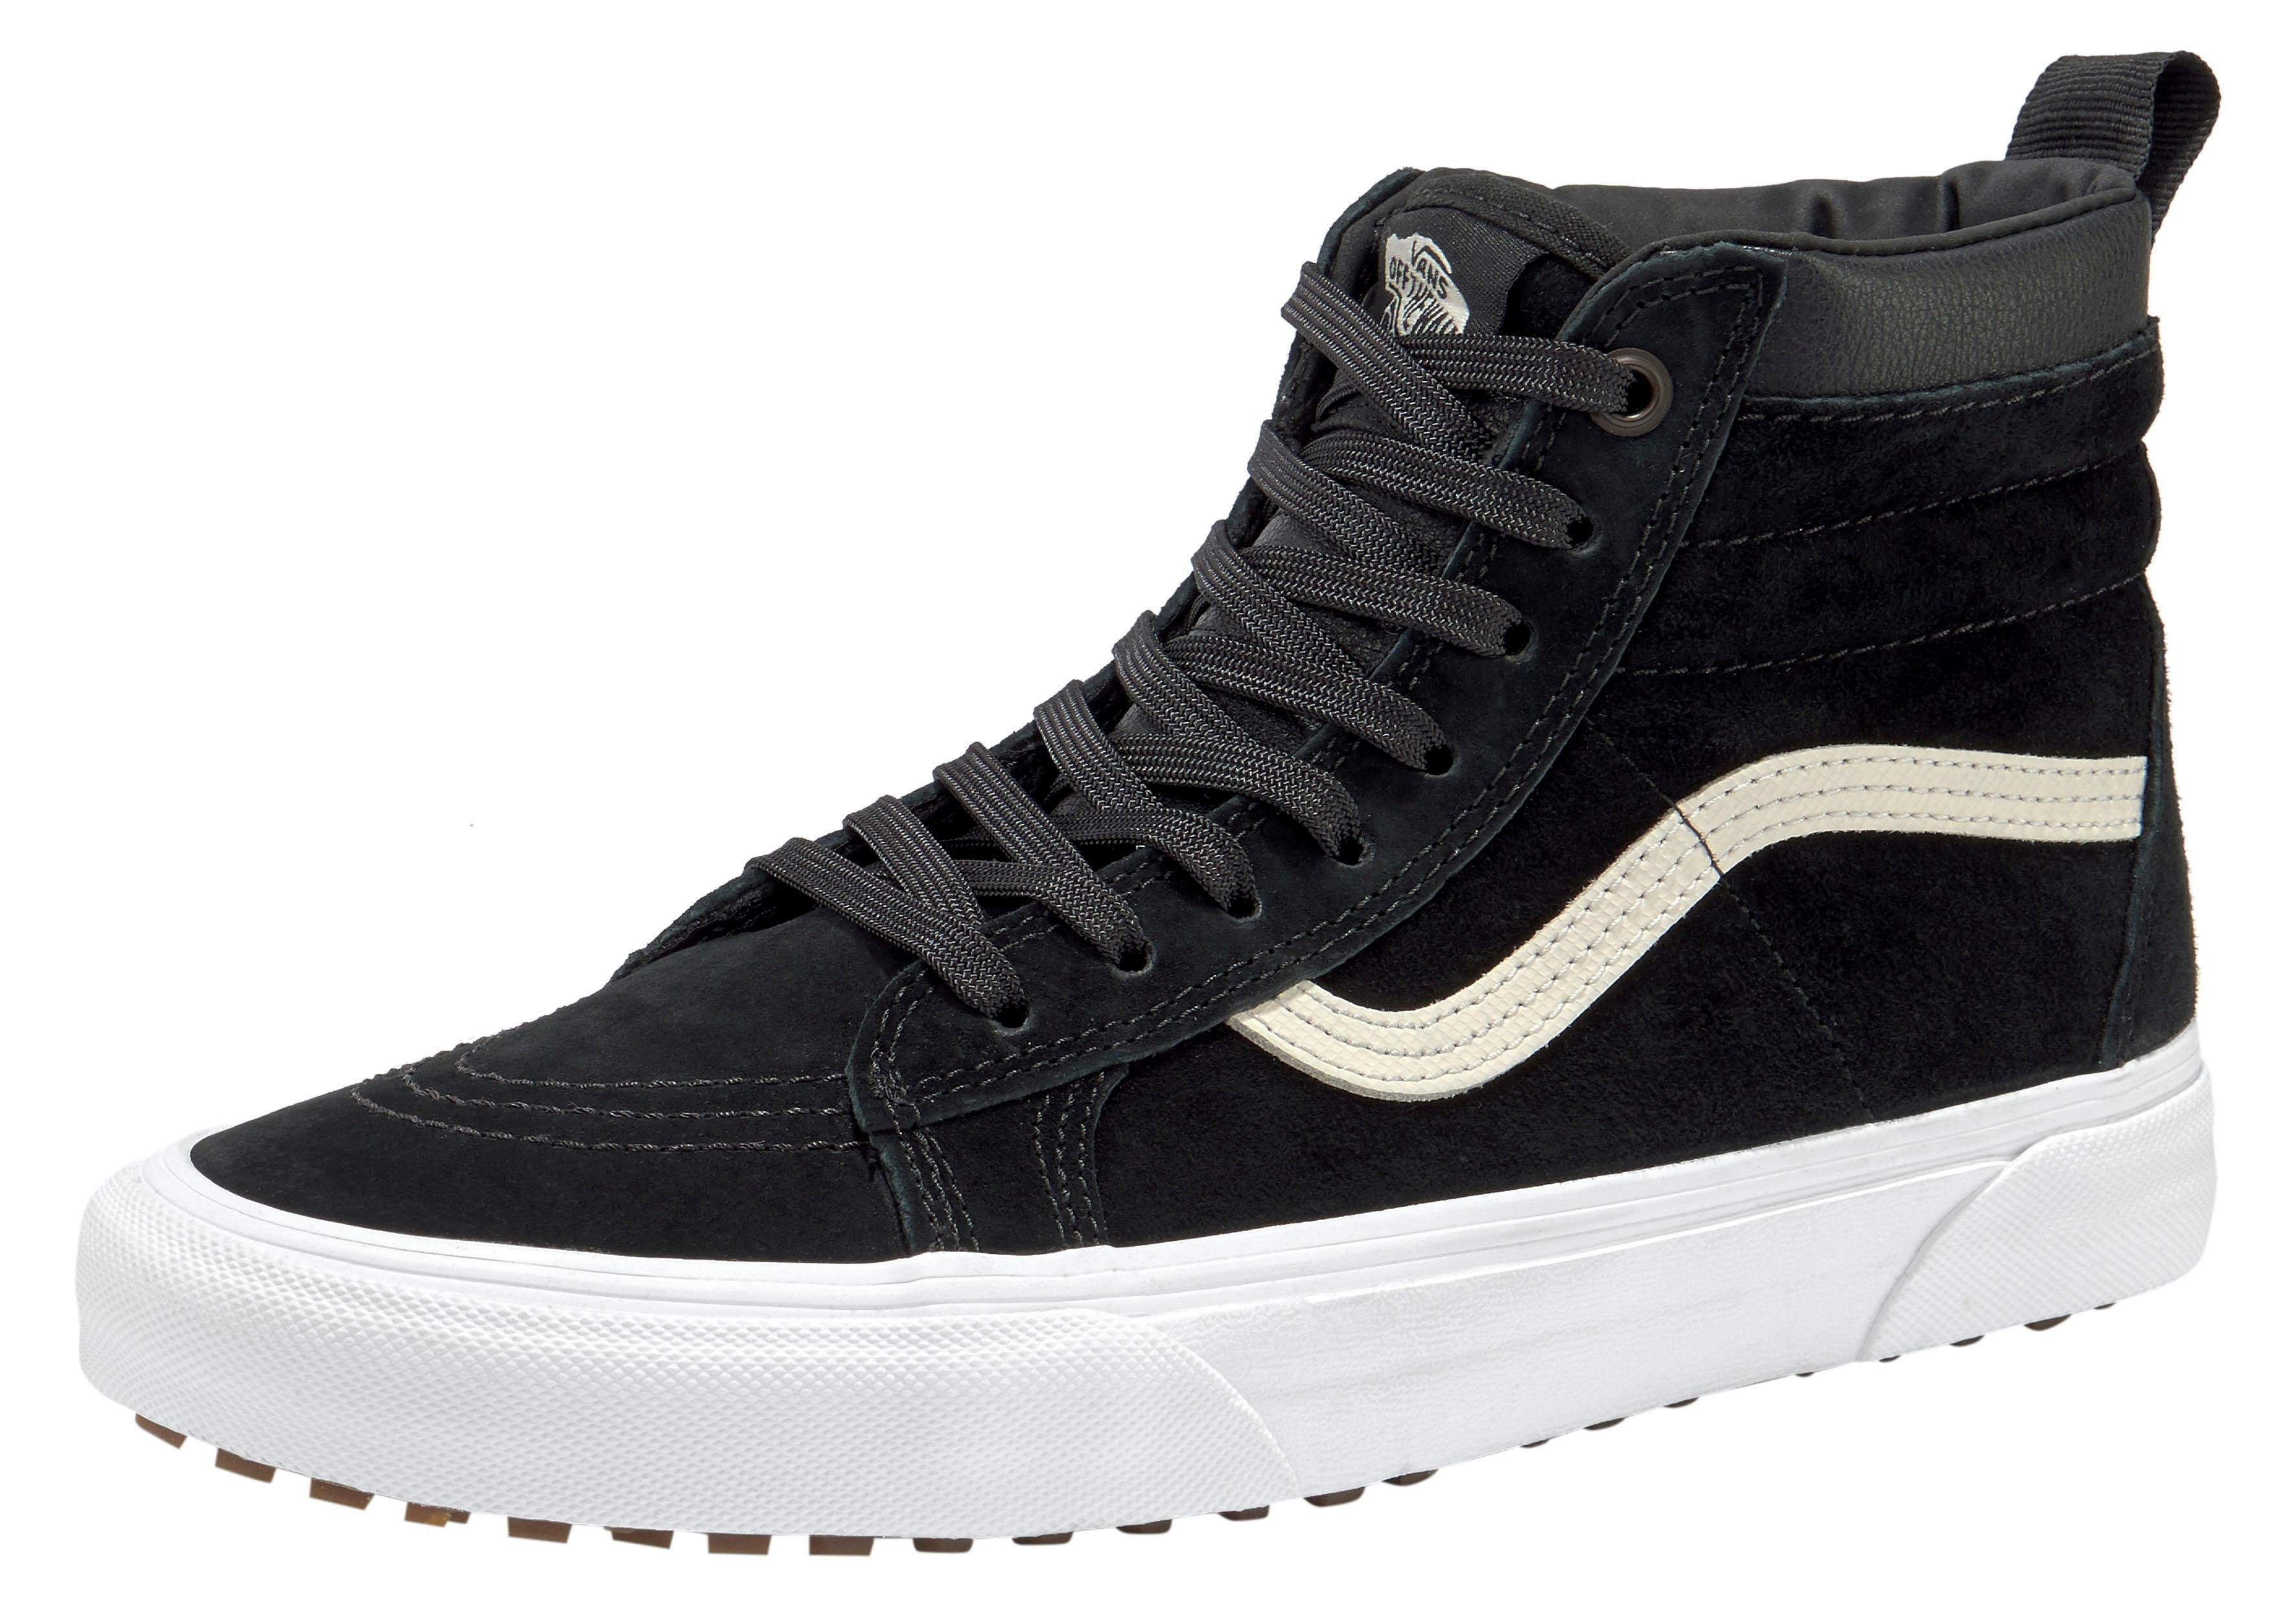 Vans »SK8 Hi MTE« Sneaker, Wärmendes Innenfutter online kaufen   OTTO